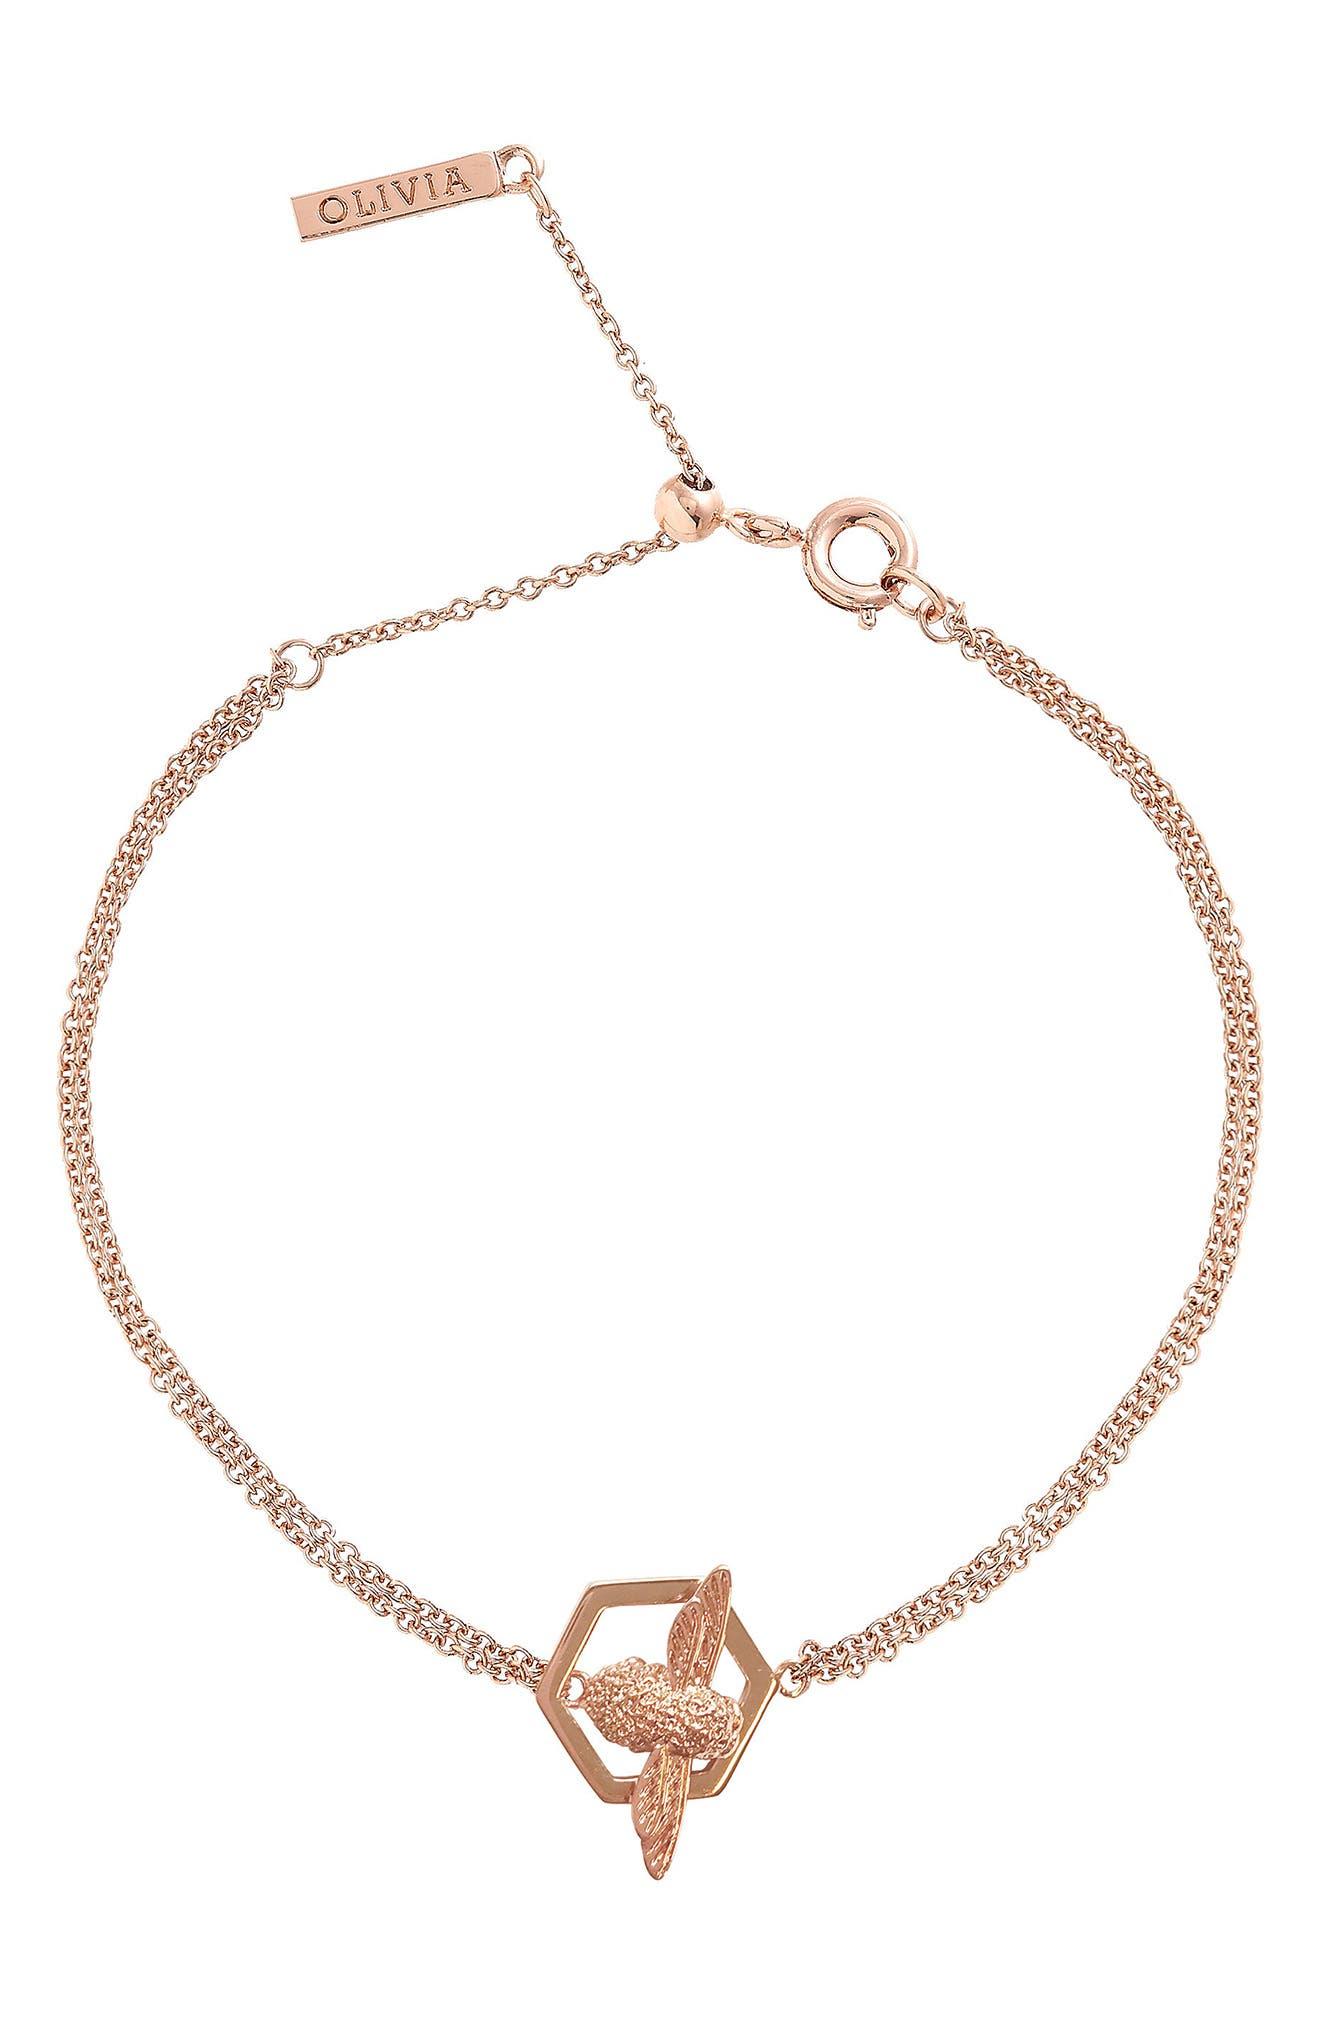 Honeycomb Bee Chain Bracelet,                             Alternate thumbnail 2, color,                             Rose Gold